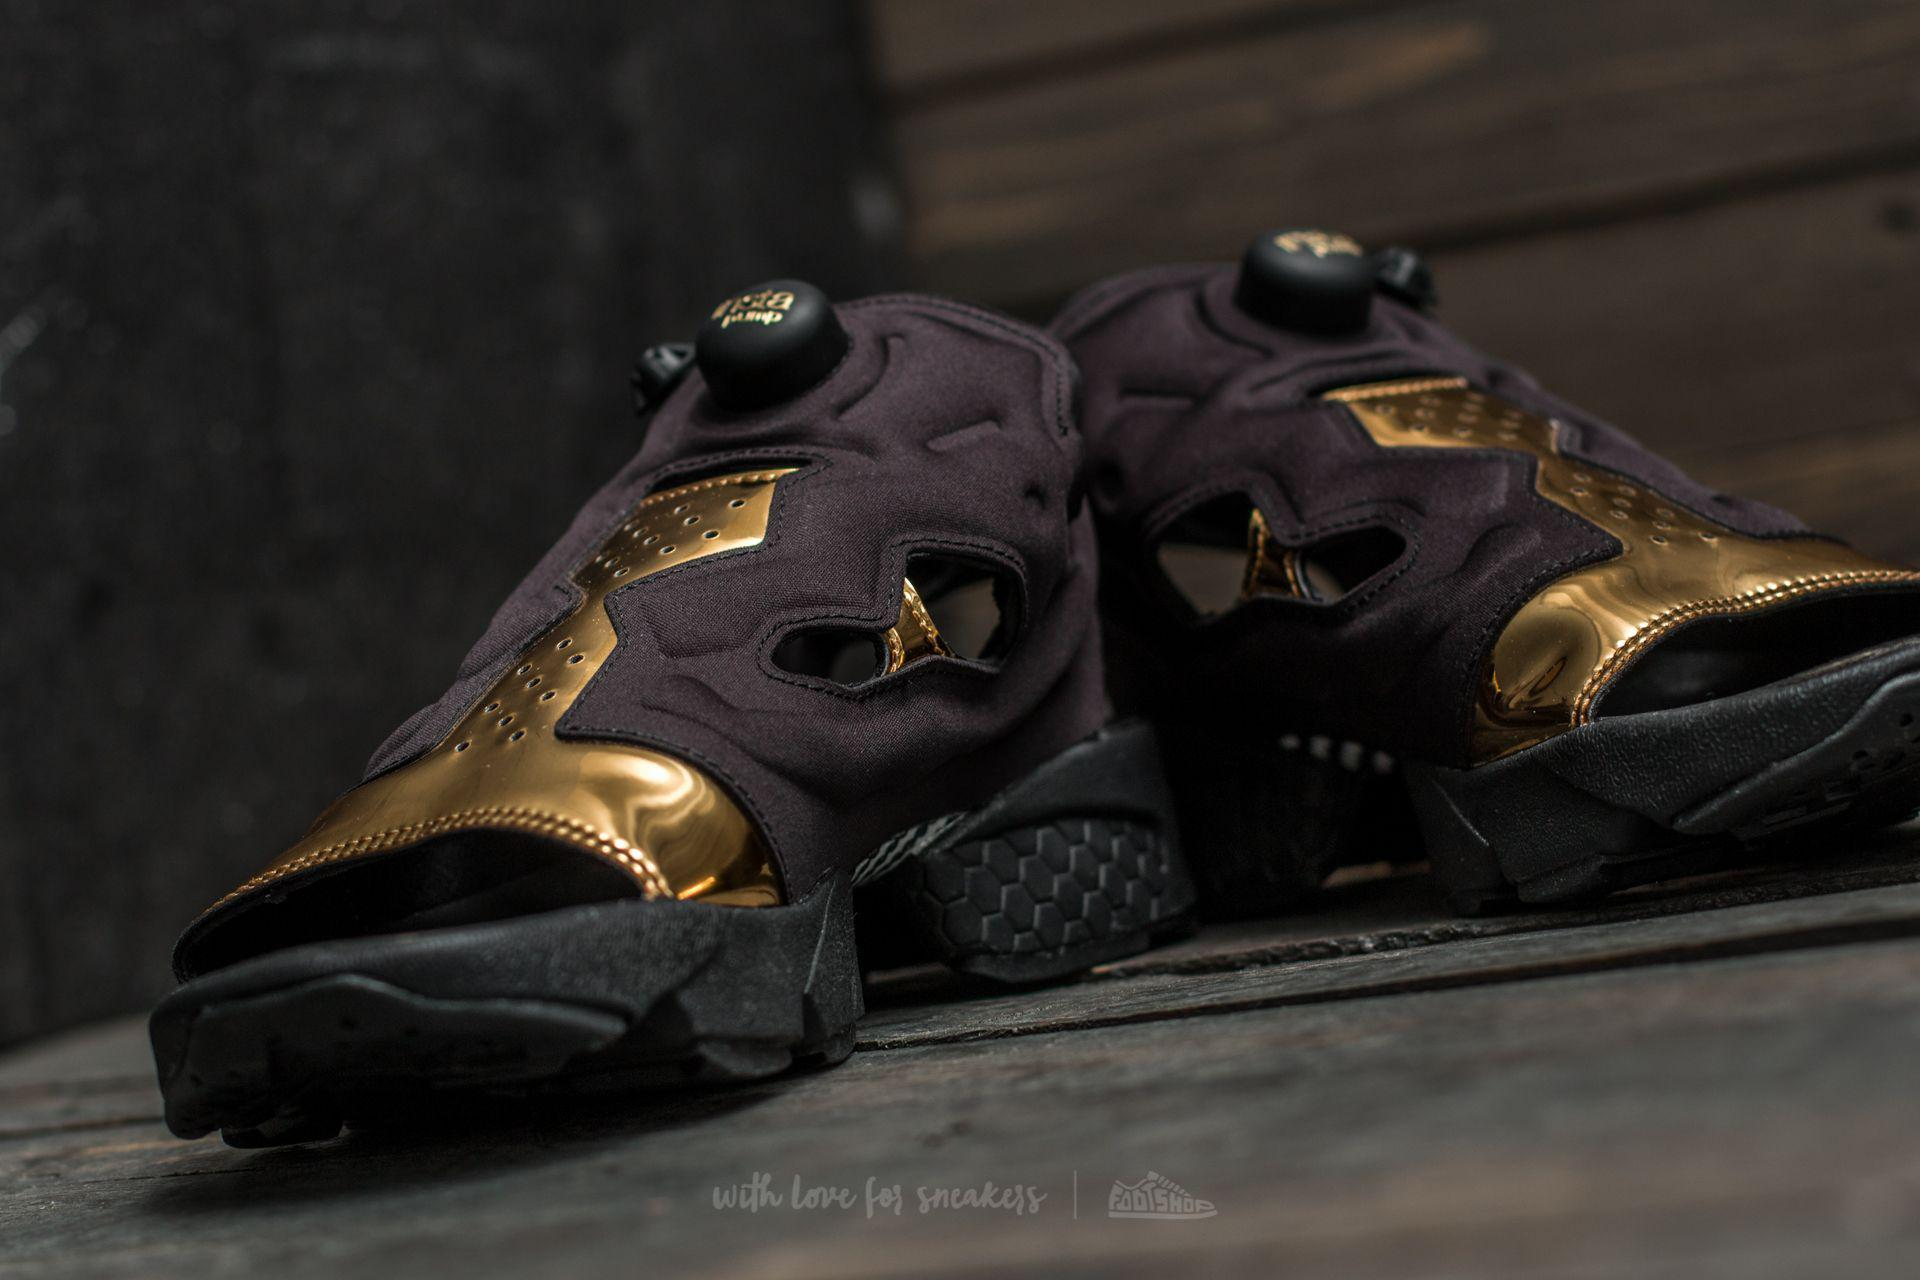 260d48066c9b5 Lyst - Reebok Instapump Fury Sandal Magic Hour Black  Gold Metal ...